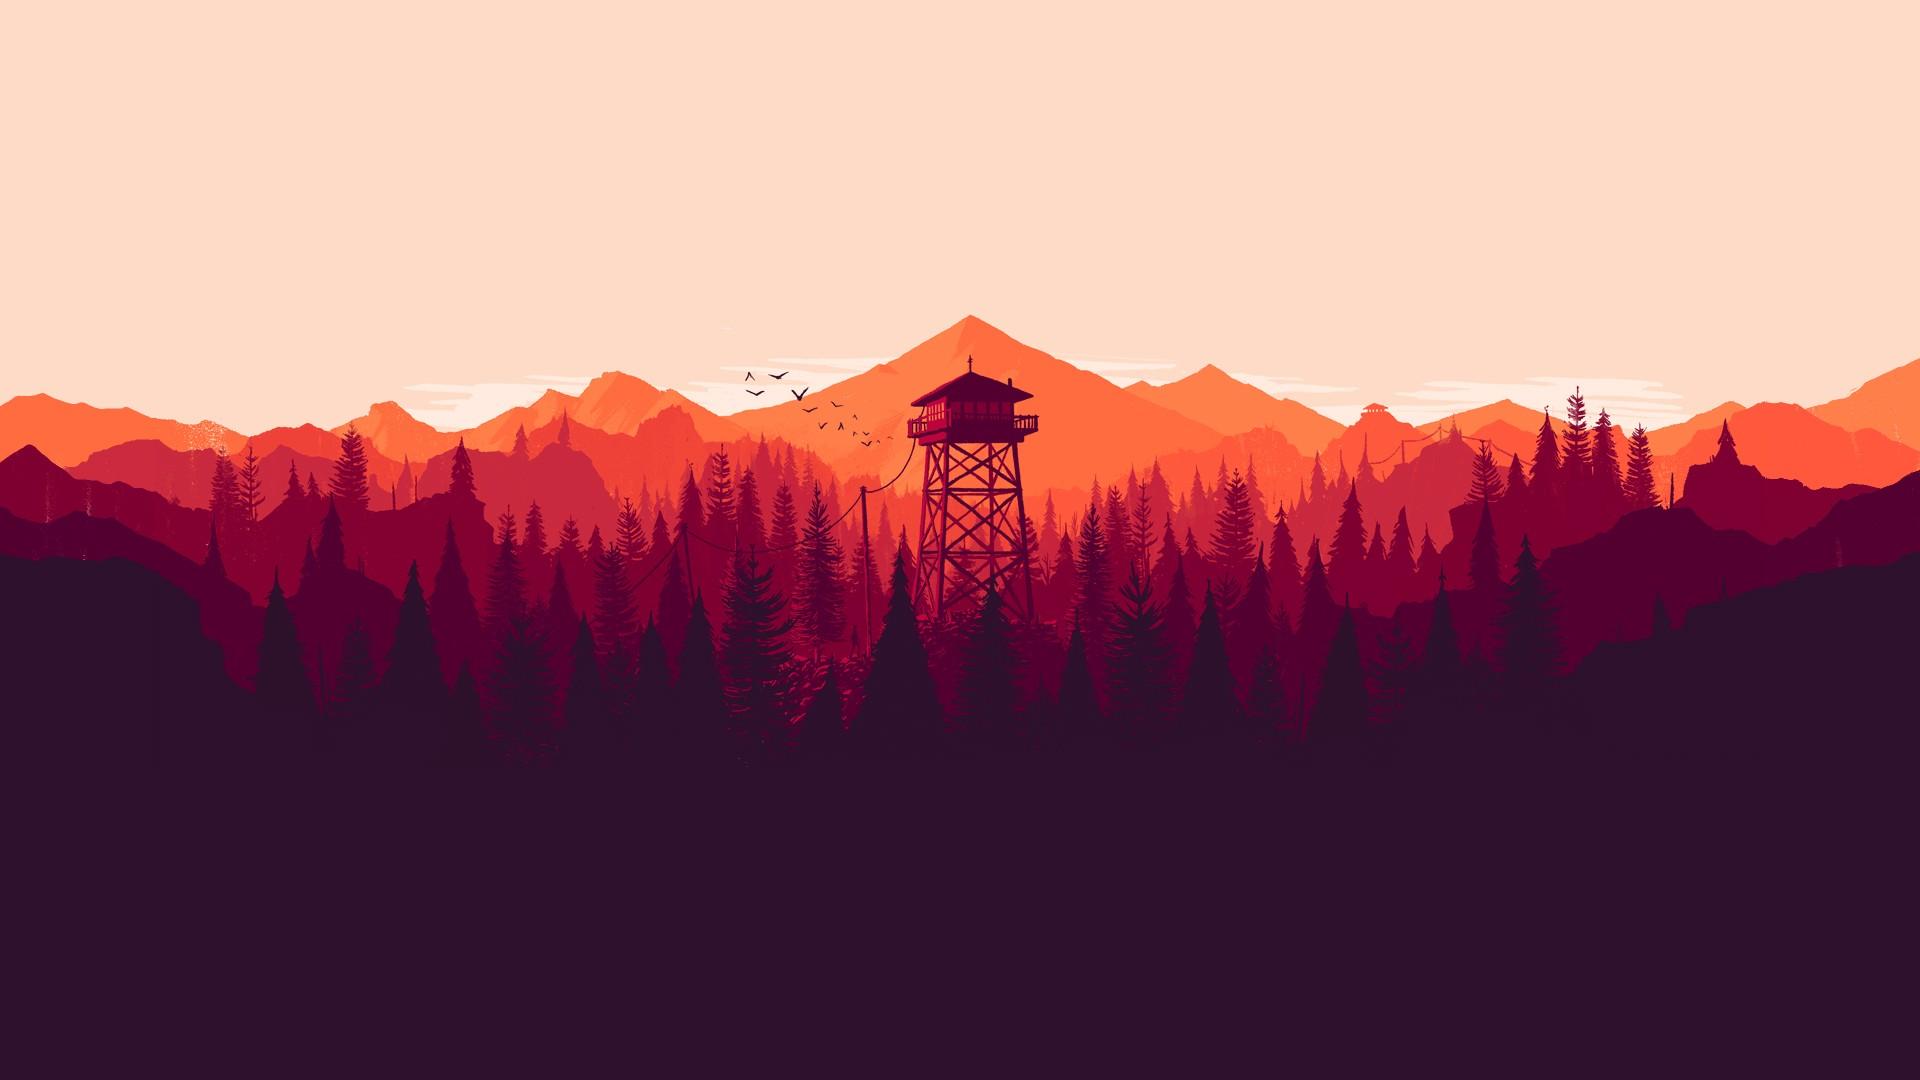 3840x1080 Pubg Wallpaper Landscape Artwork Firewatch Nature Minimalism Video